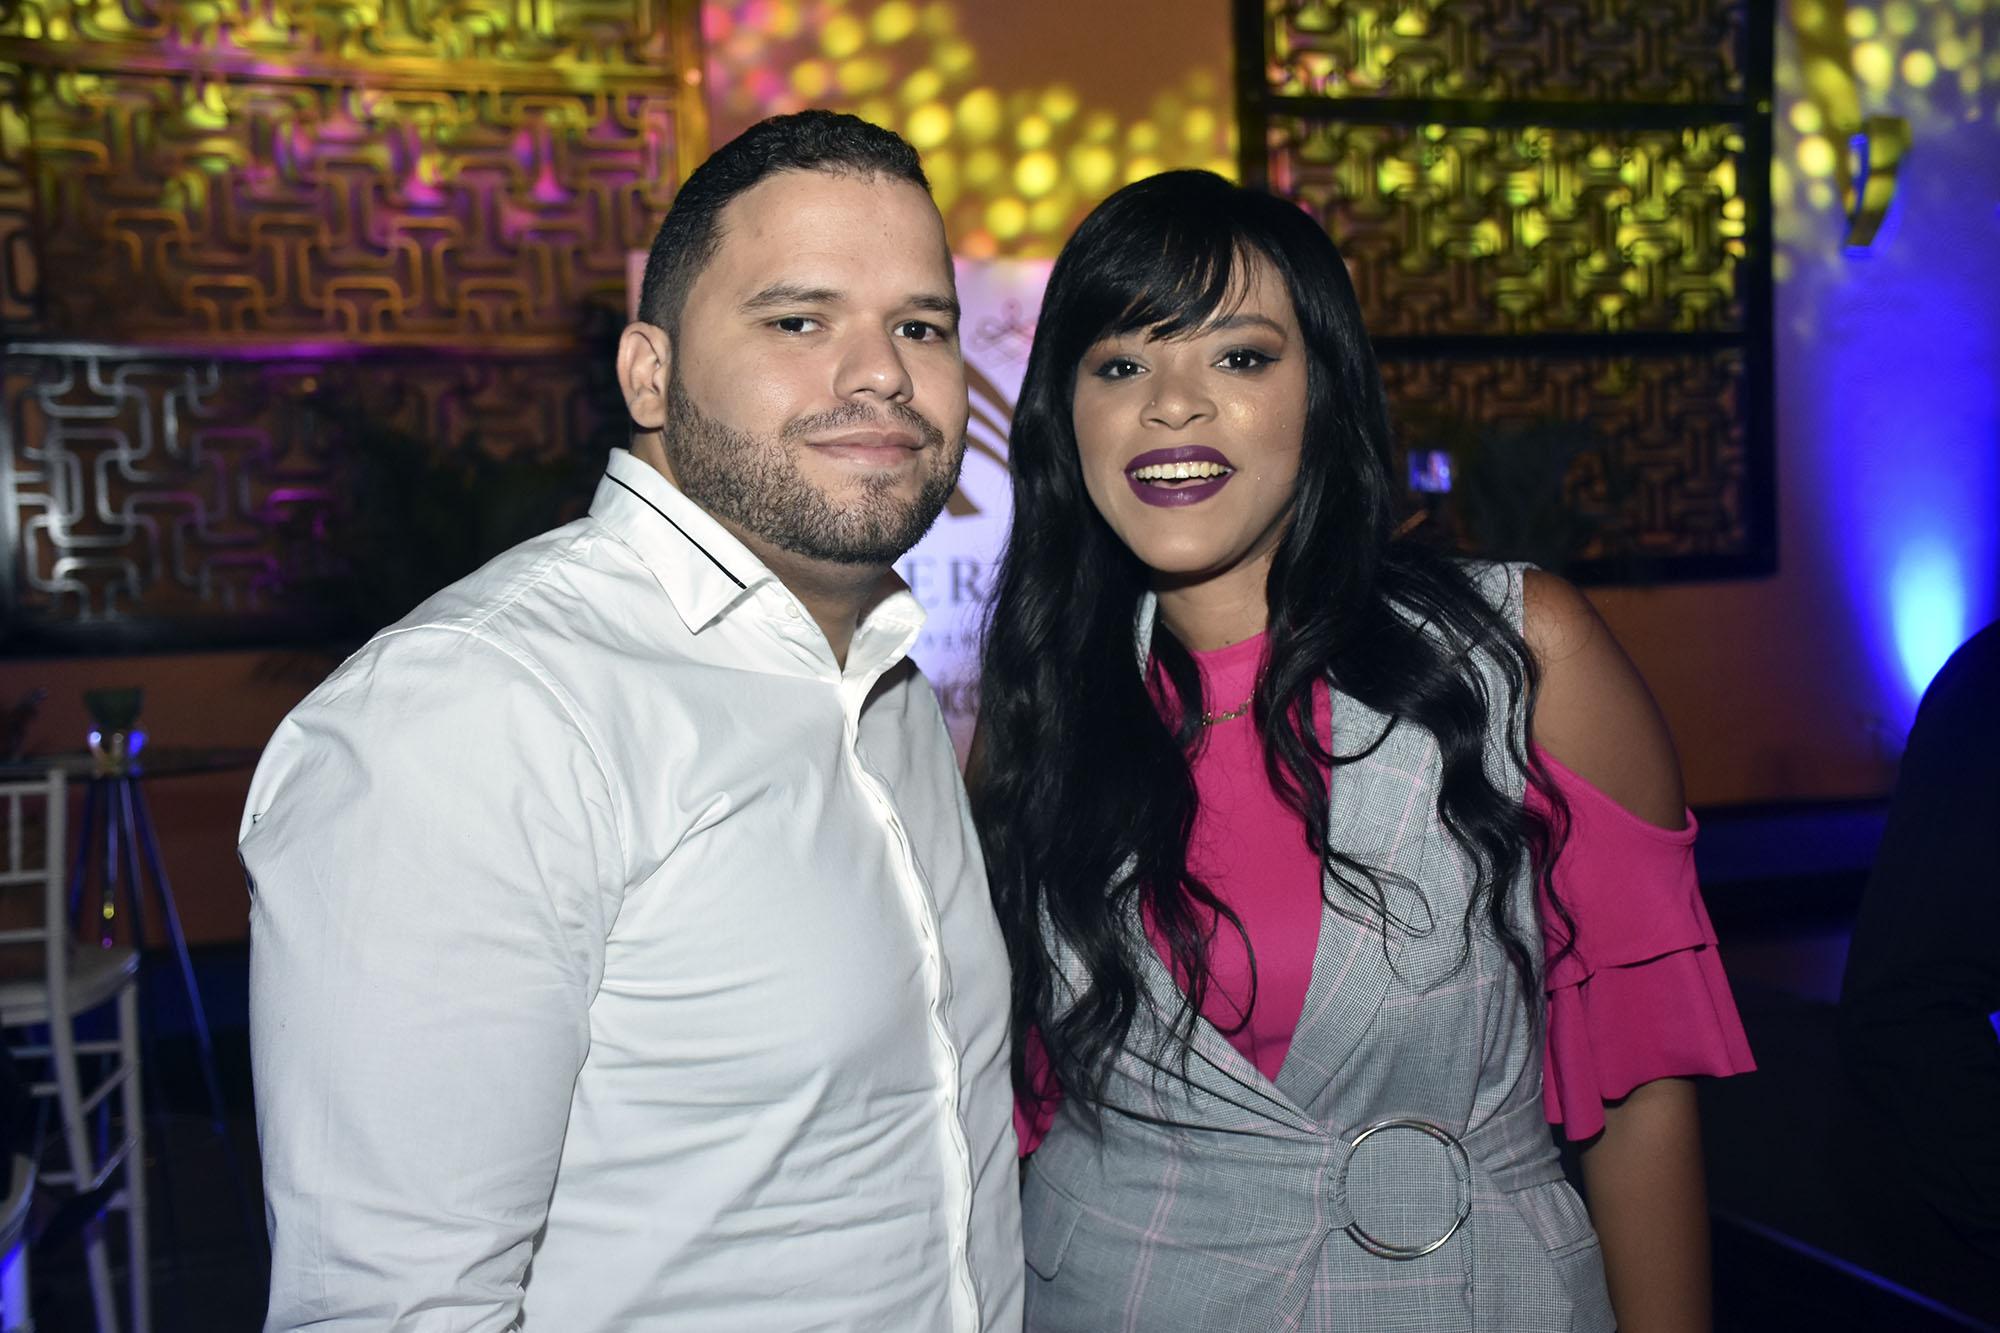 Jose Rodriguez y Justine Zabala